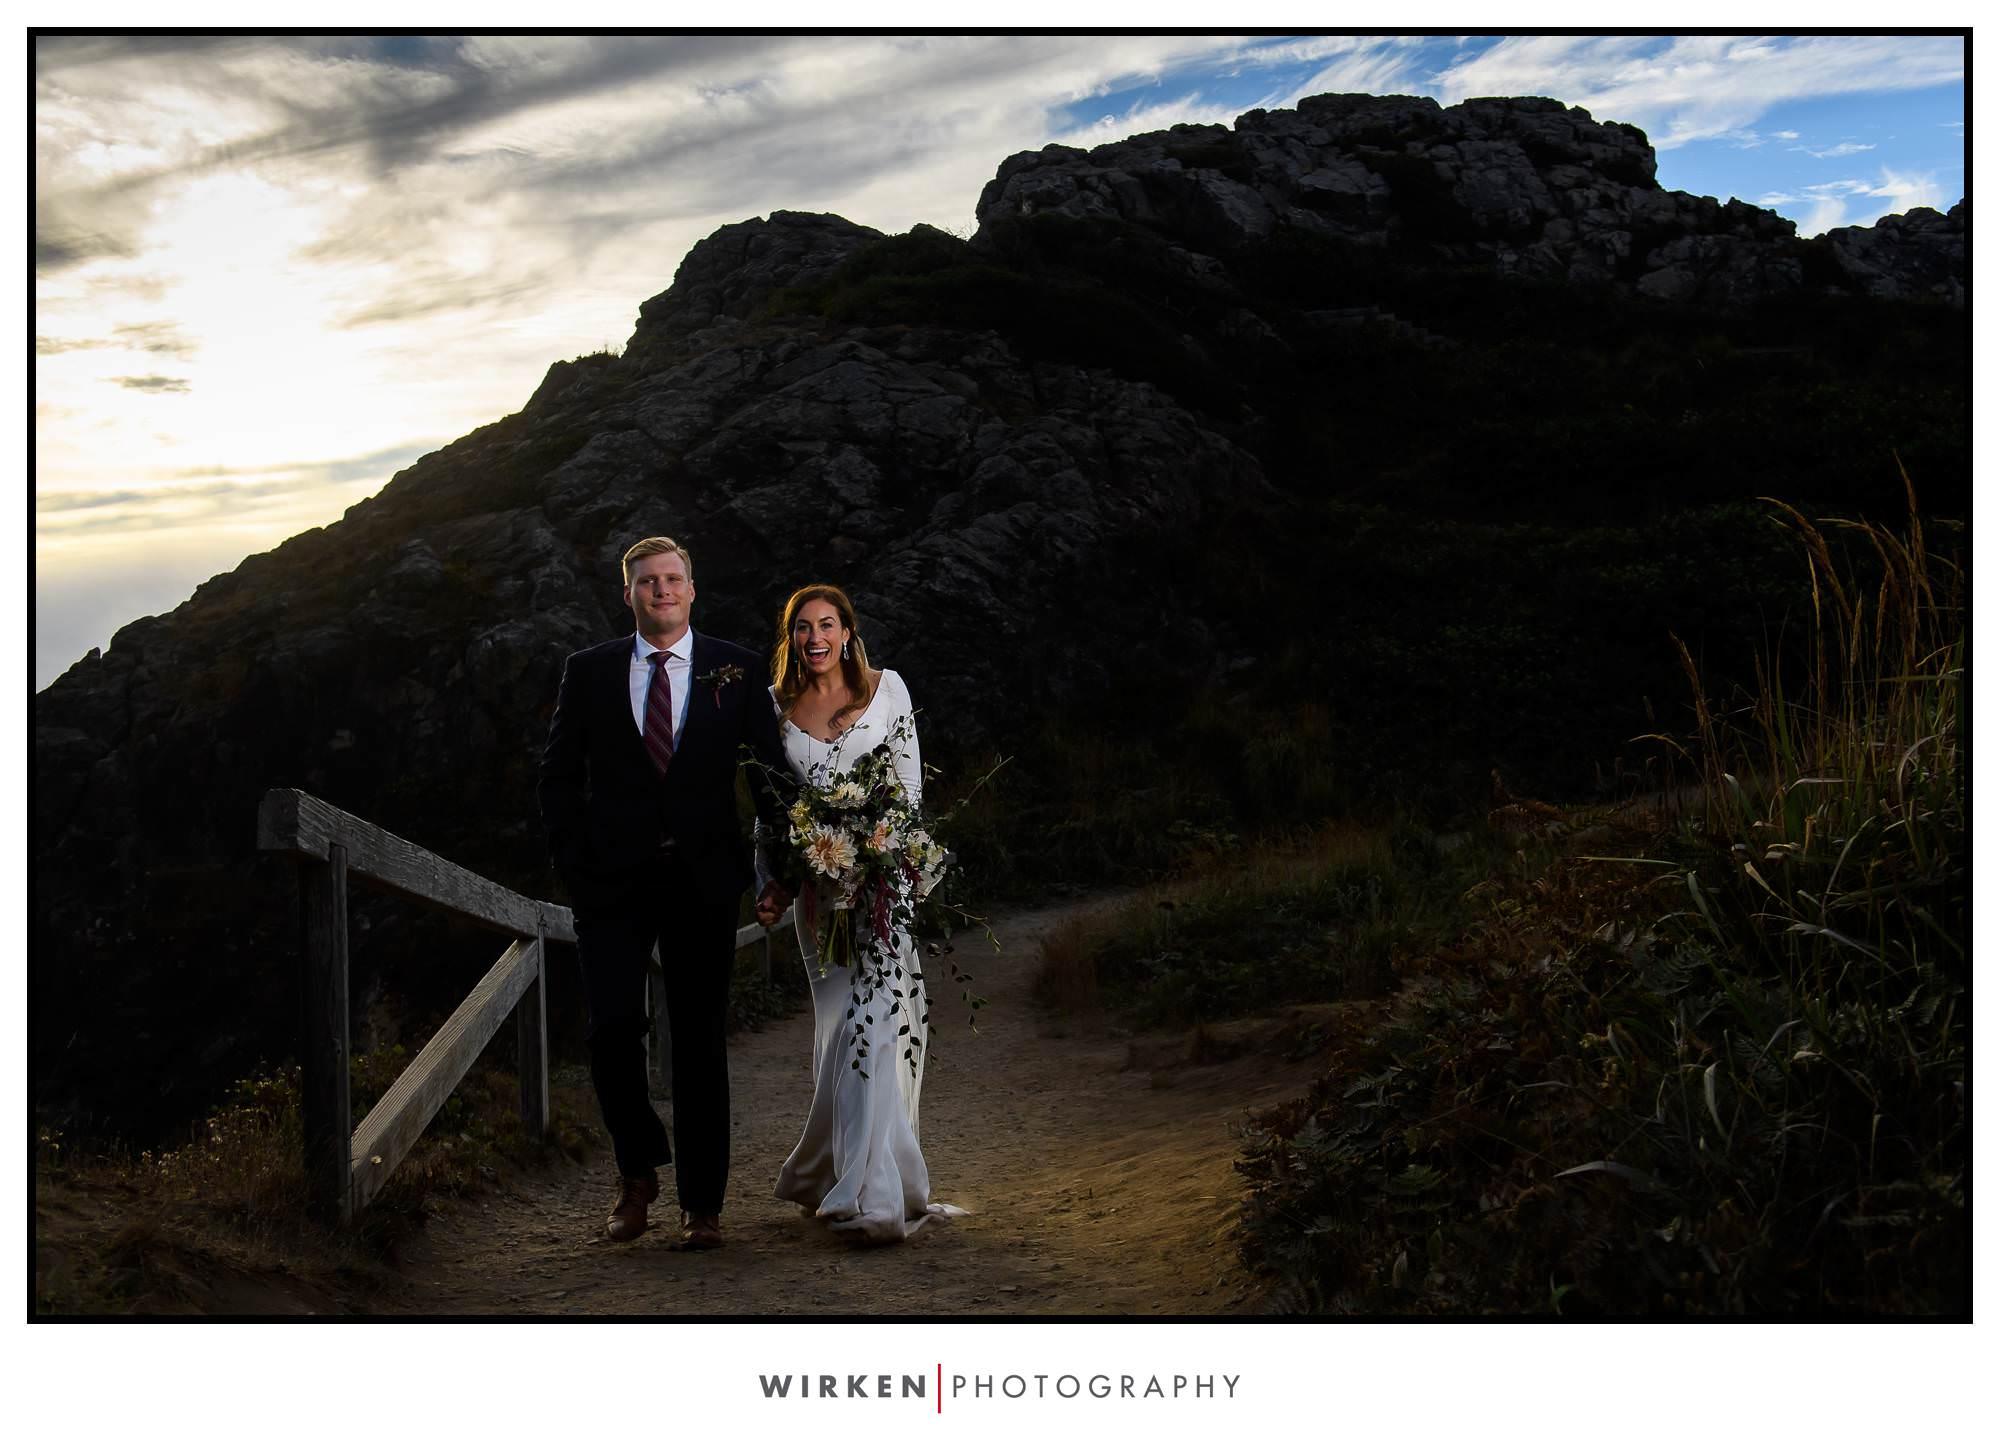 Adventure wedding at Patrick's Point Park Wedding Rock